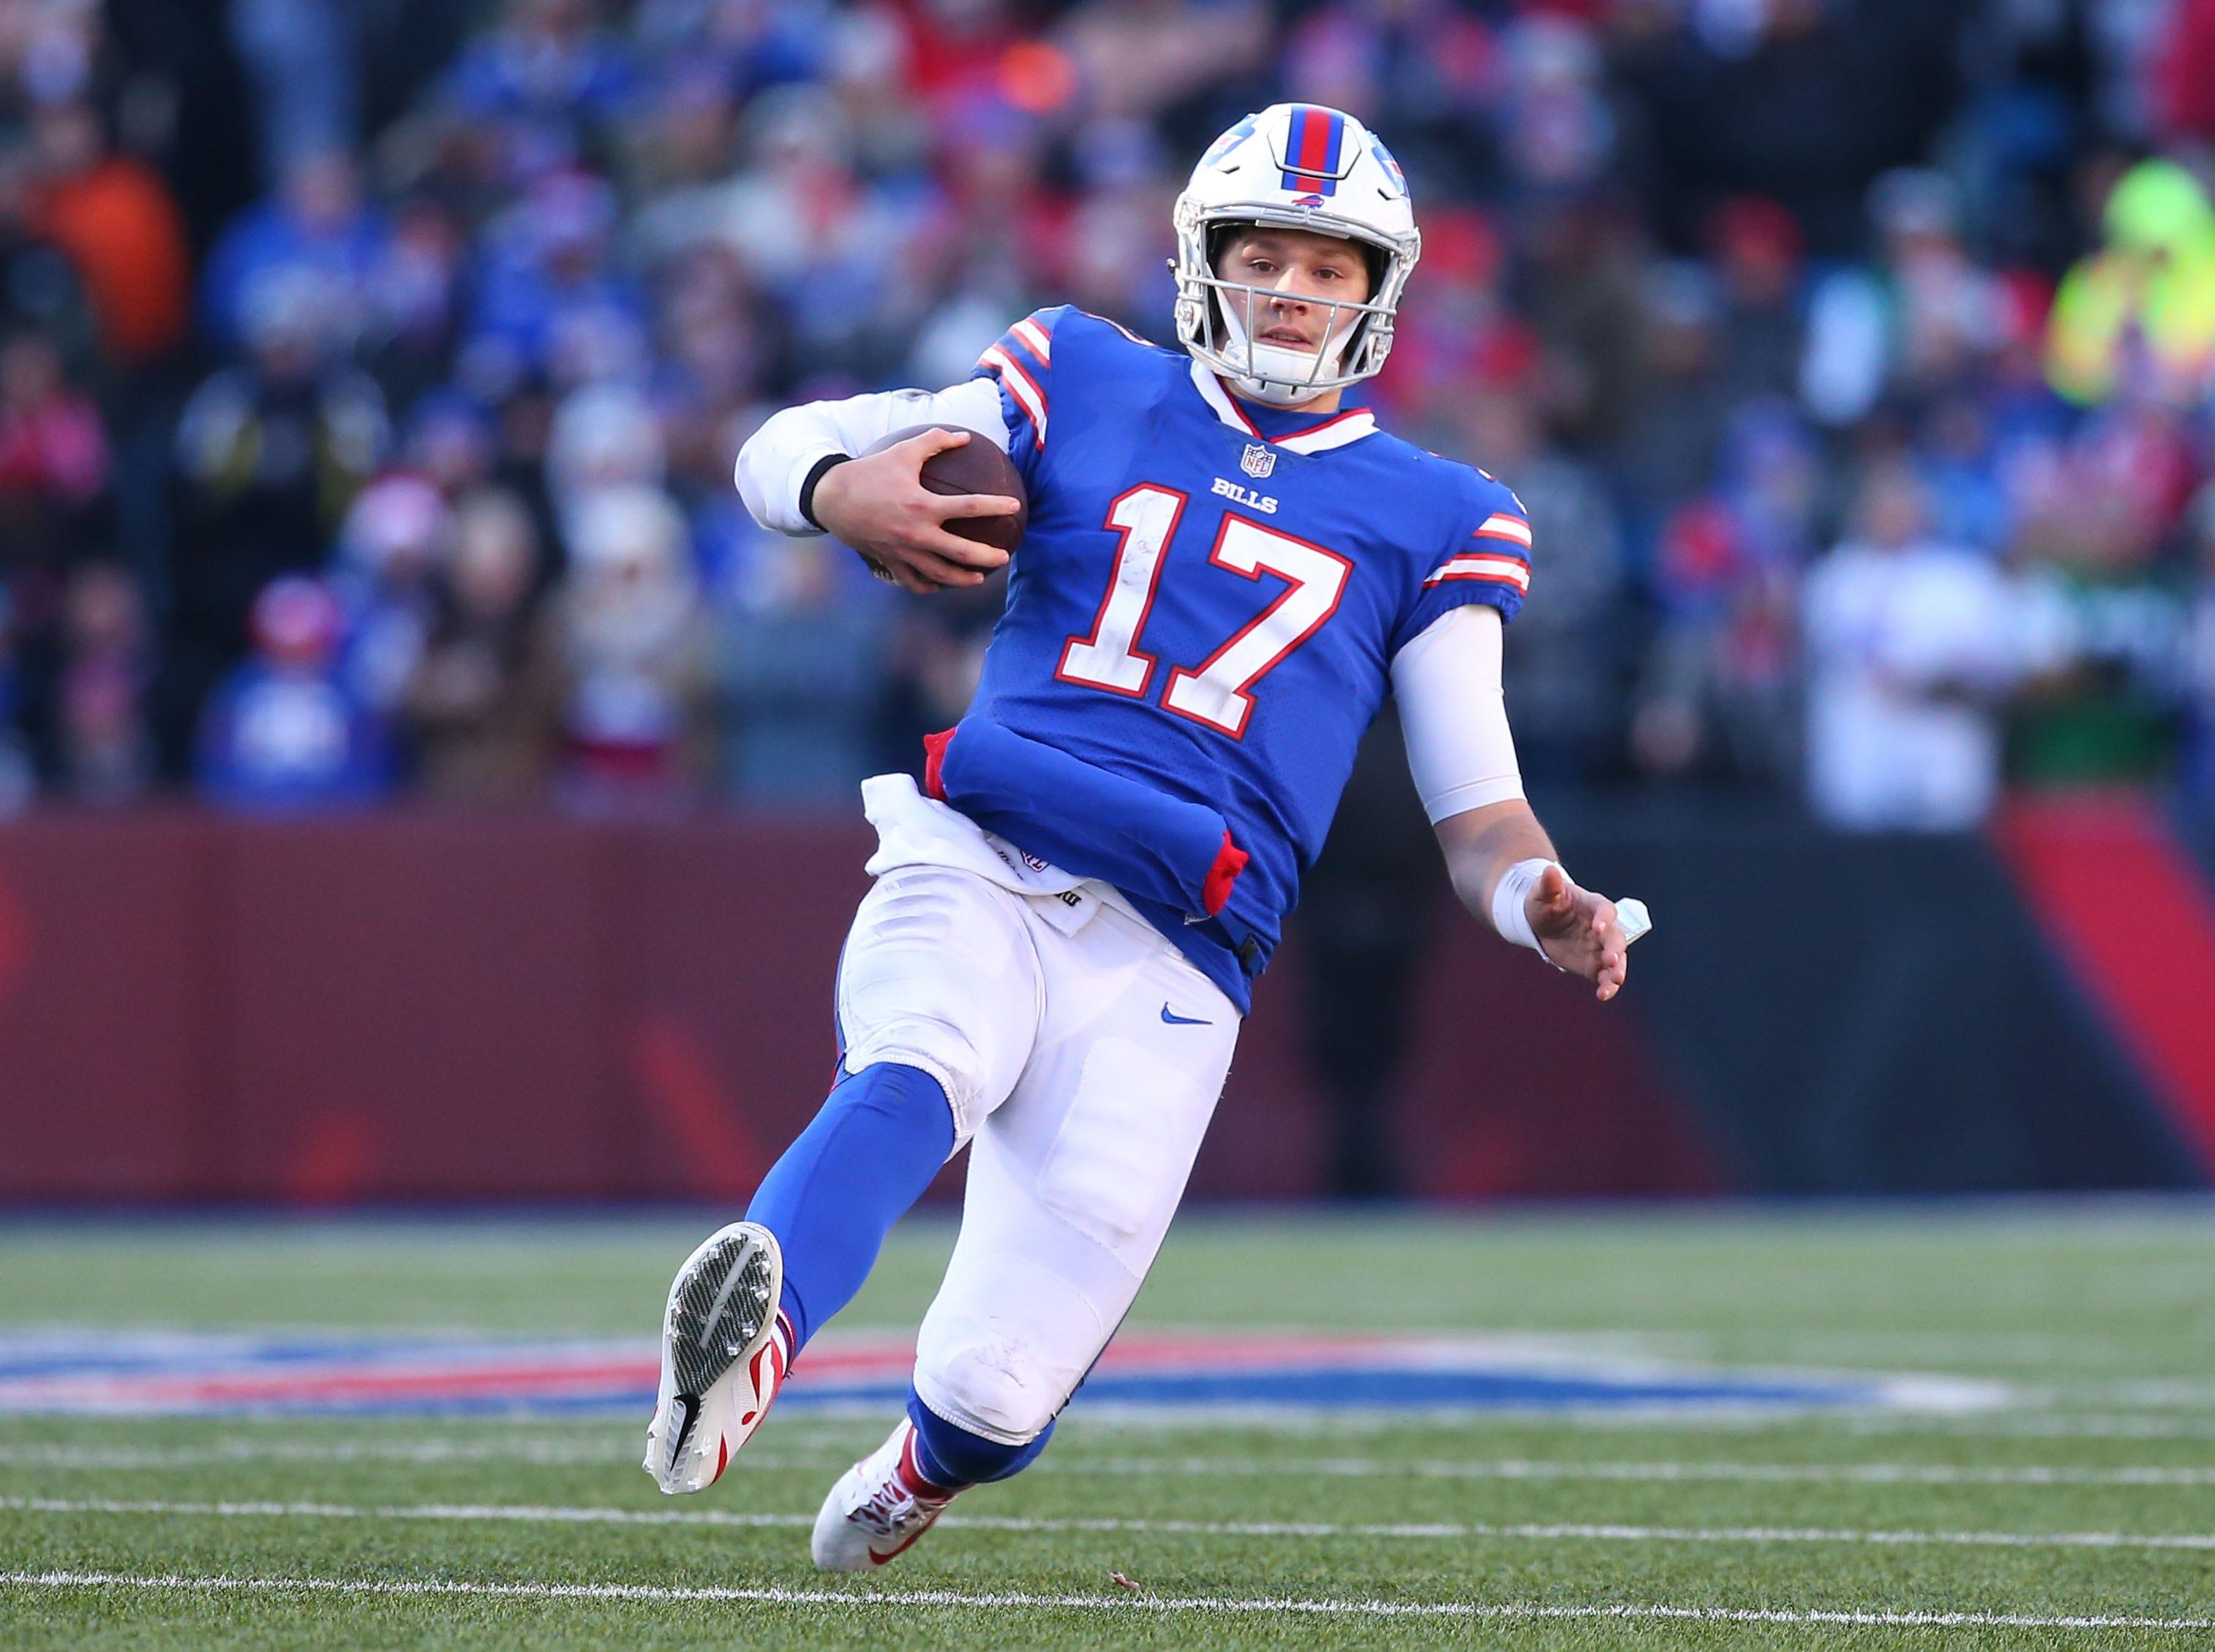 Bills quarterback Josh Allen slides following a run against the Jets.